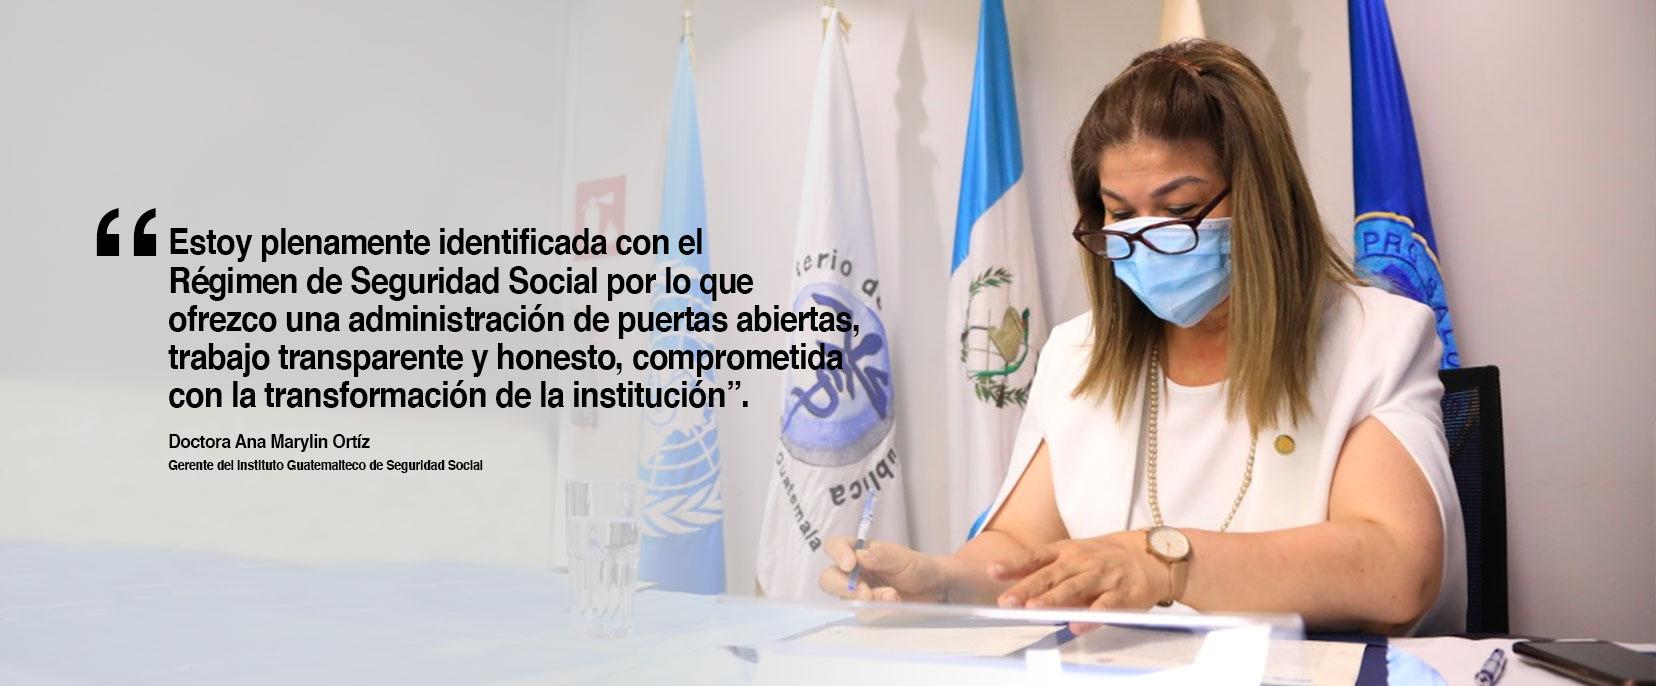 Comunicado Doctora Ana Marylin Ortiz